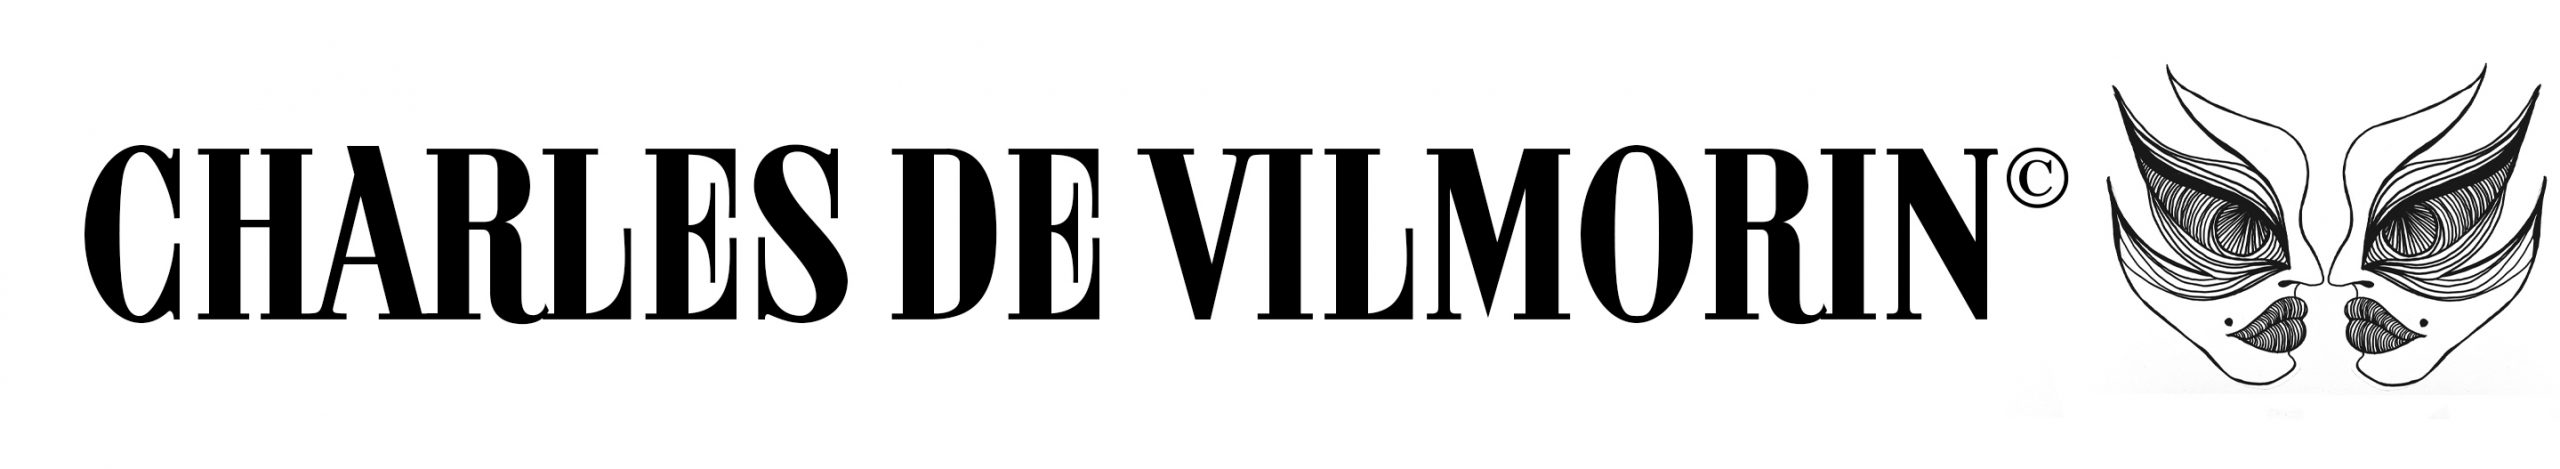 Charles de Vilmorin